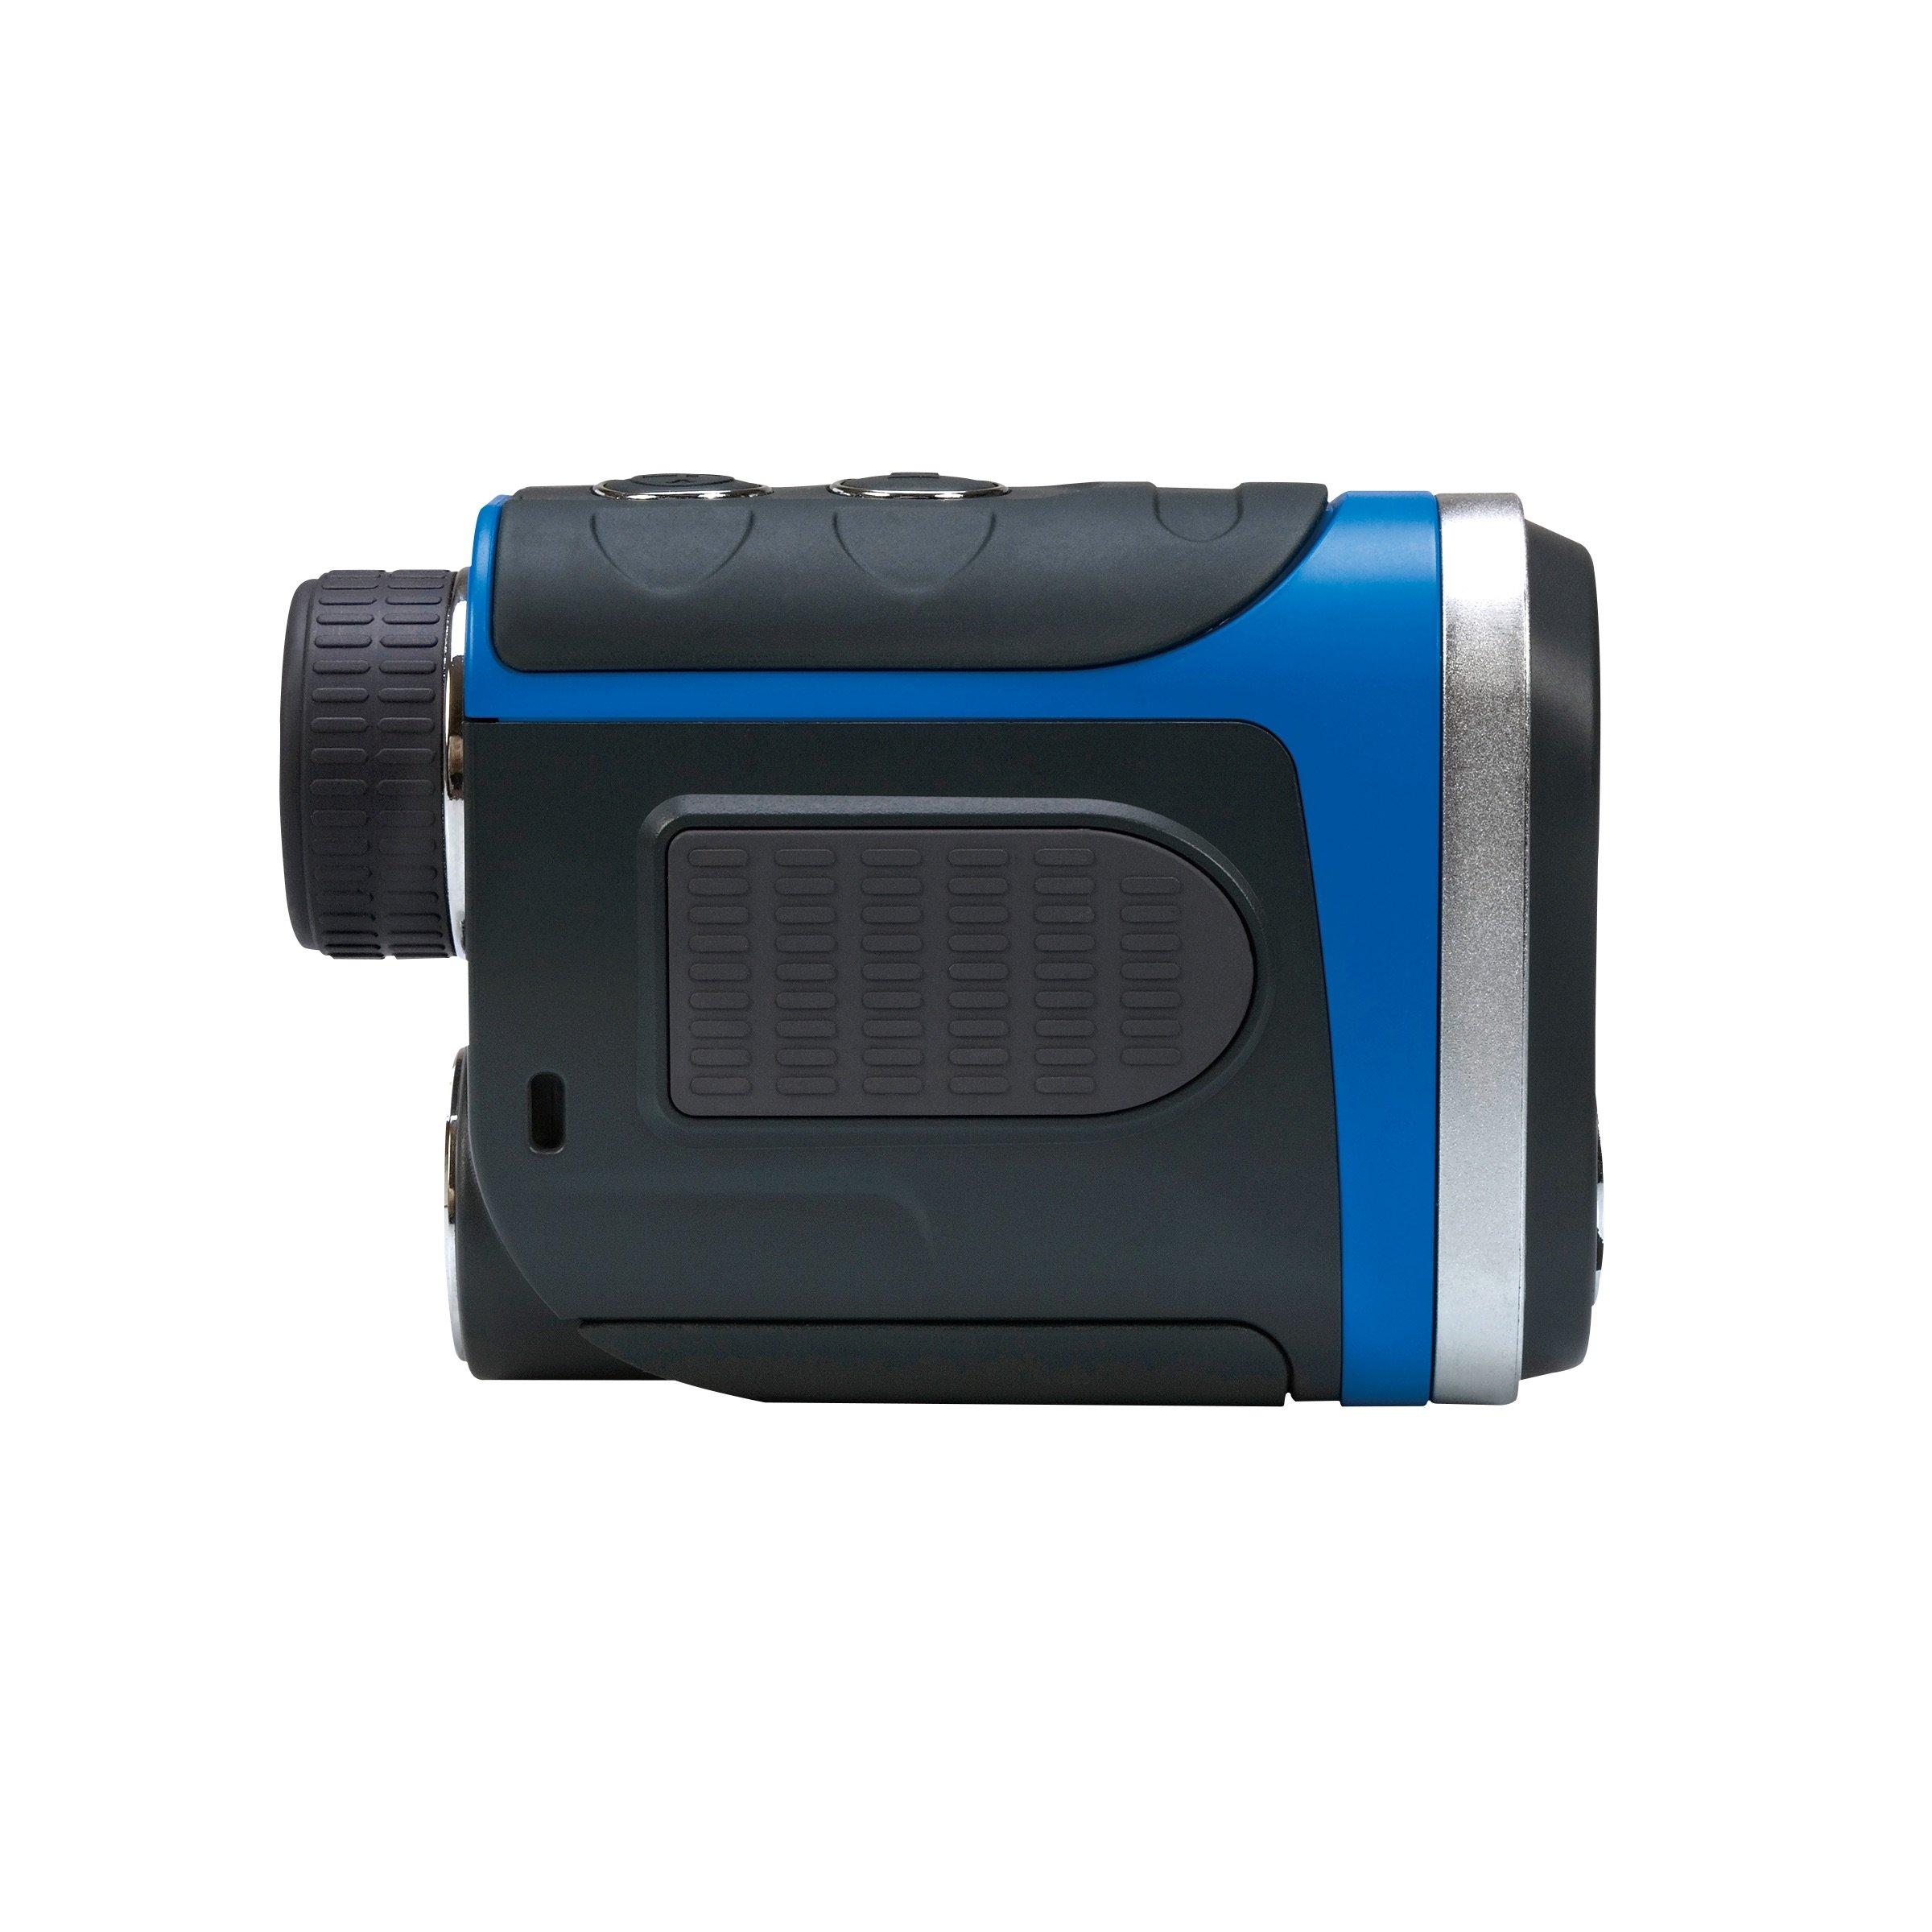 GolfBuddy LR5S Golf Laser Rangefinder with Slope, Dark Gray/Blue by GolfBuddy (Image #7)